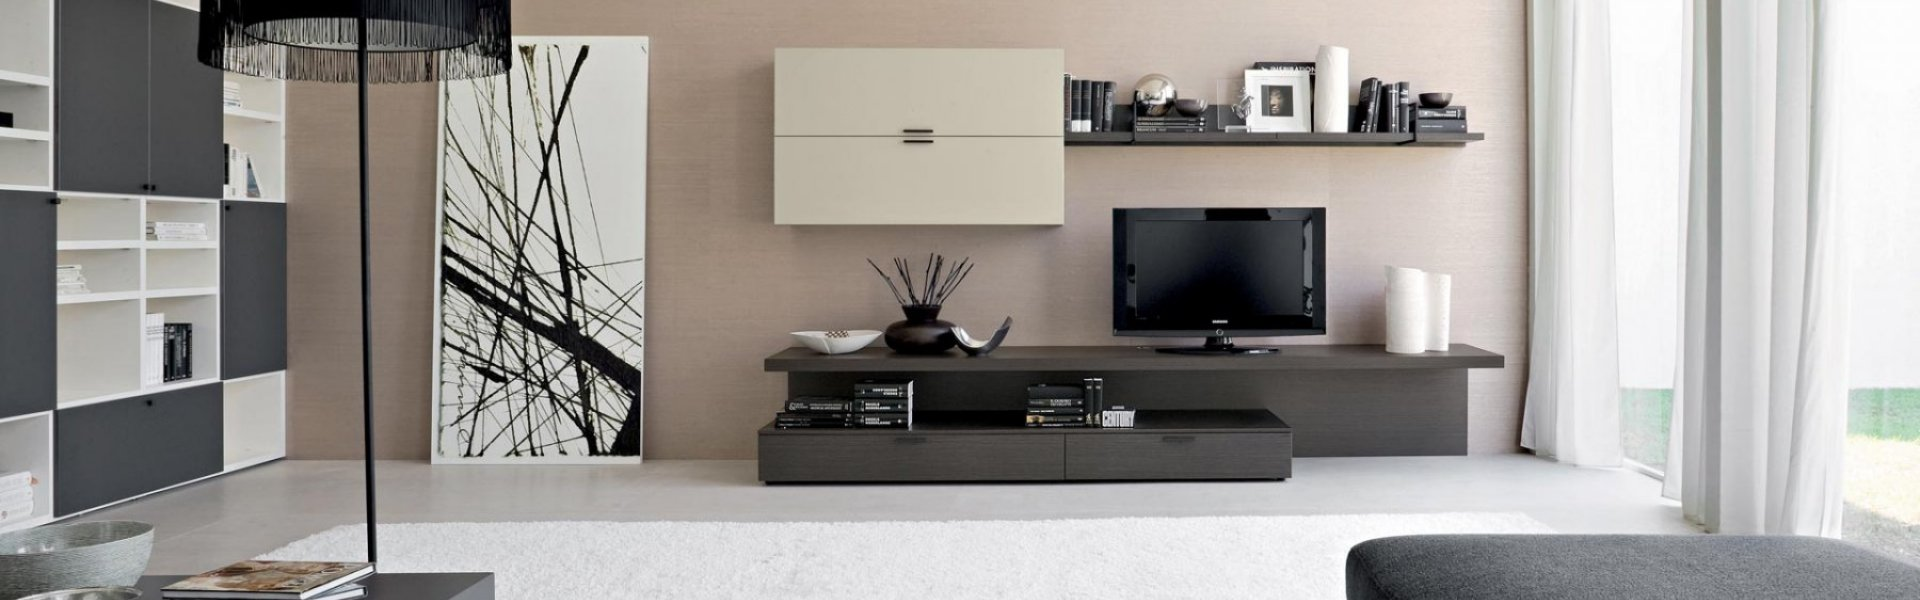 Un salon moderne